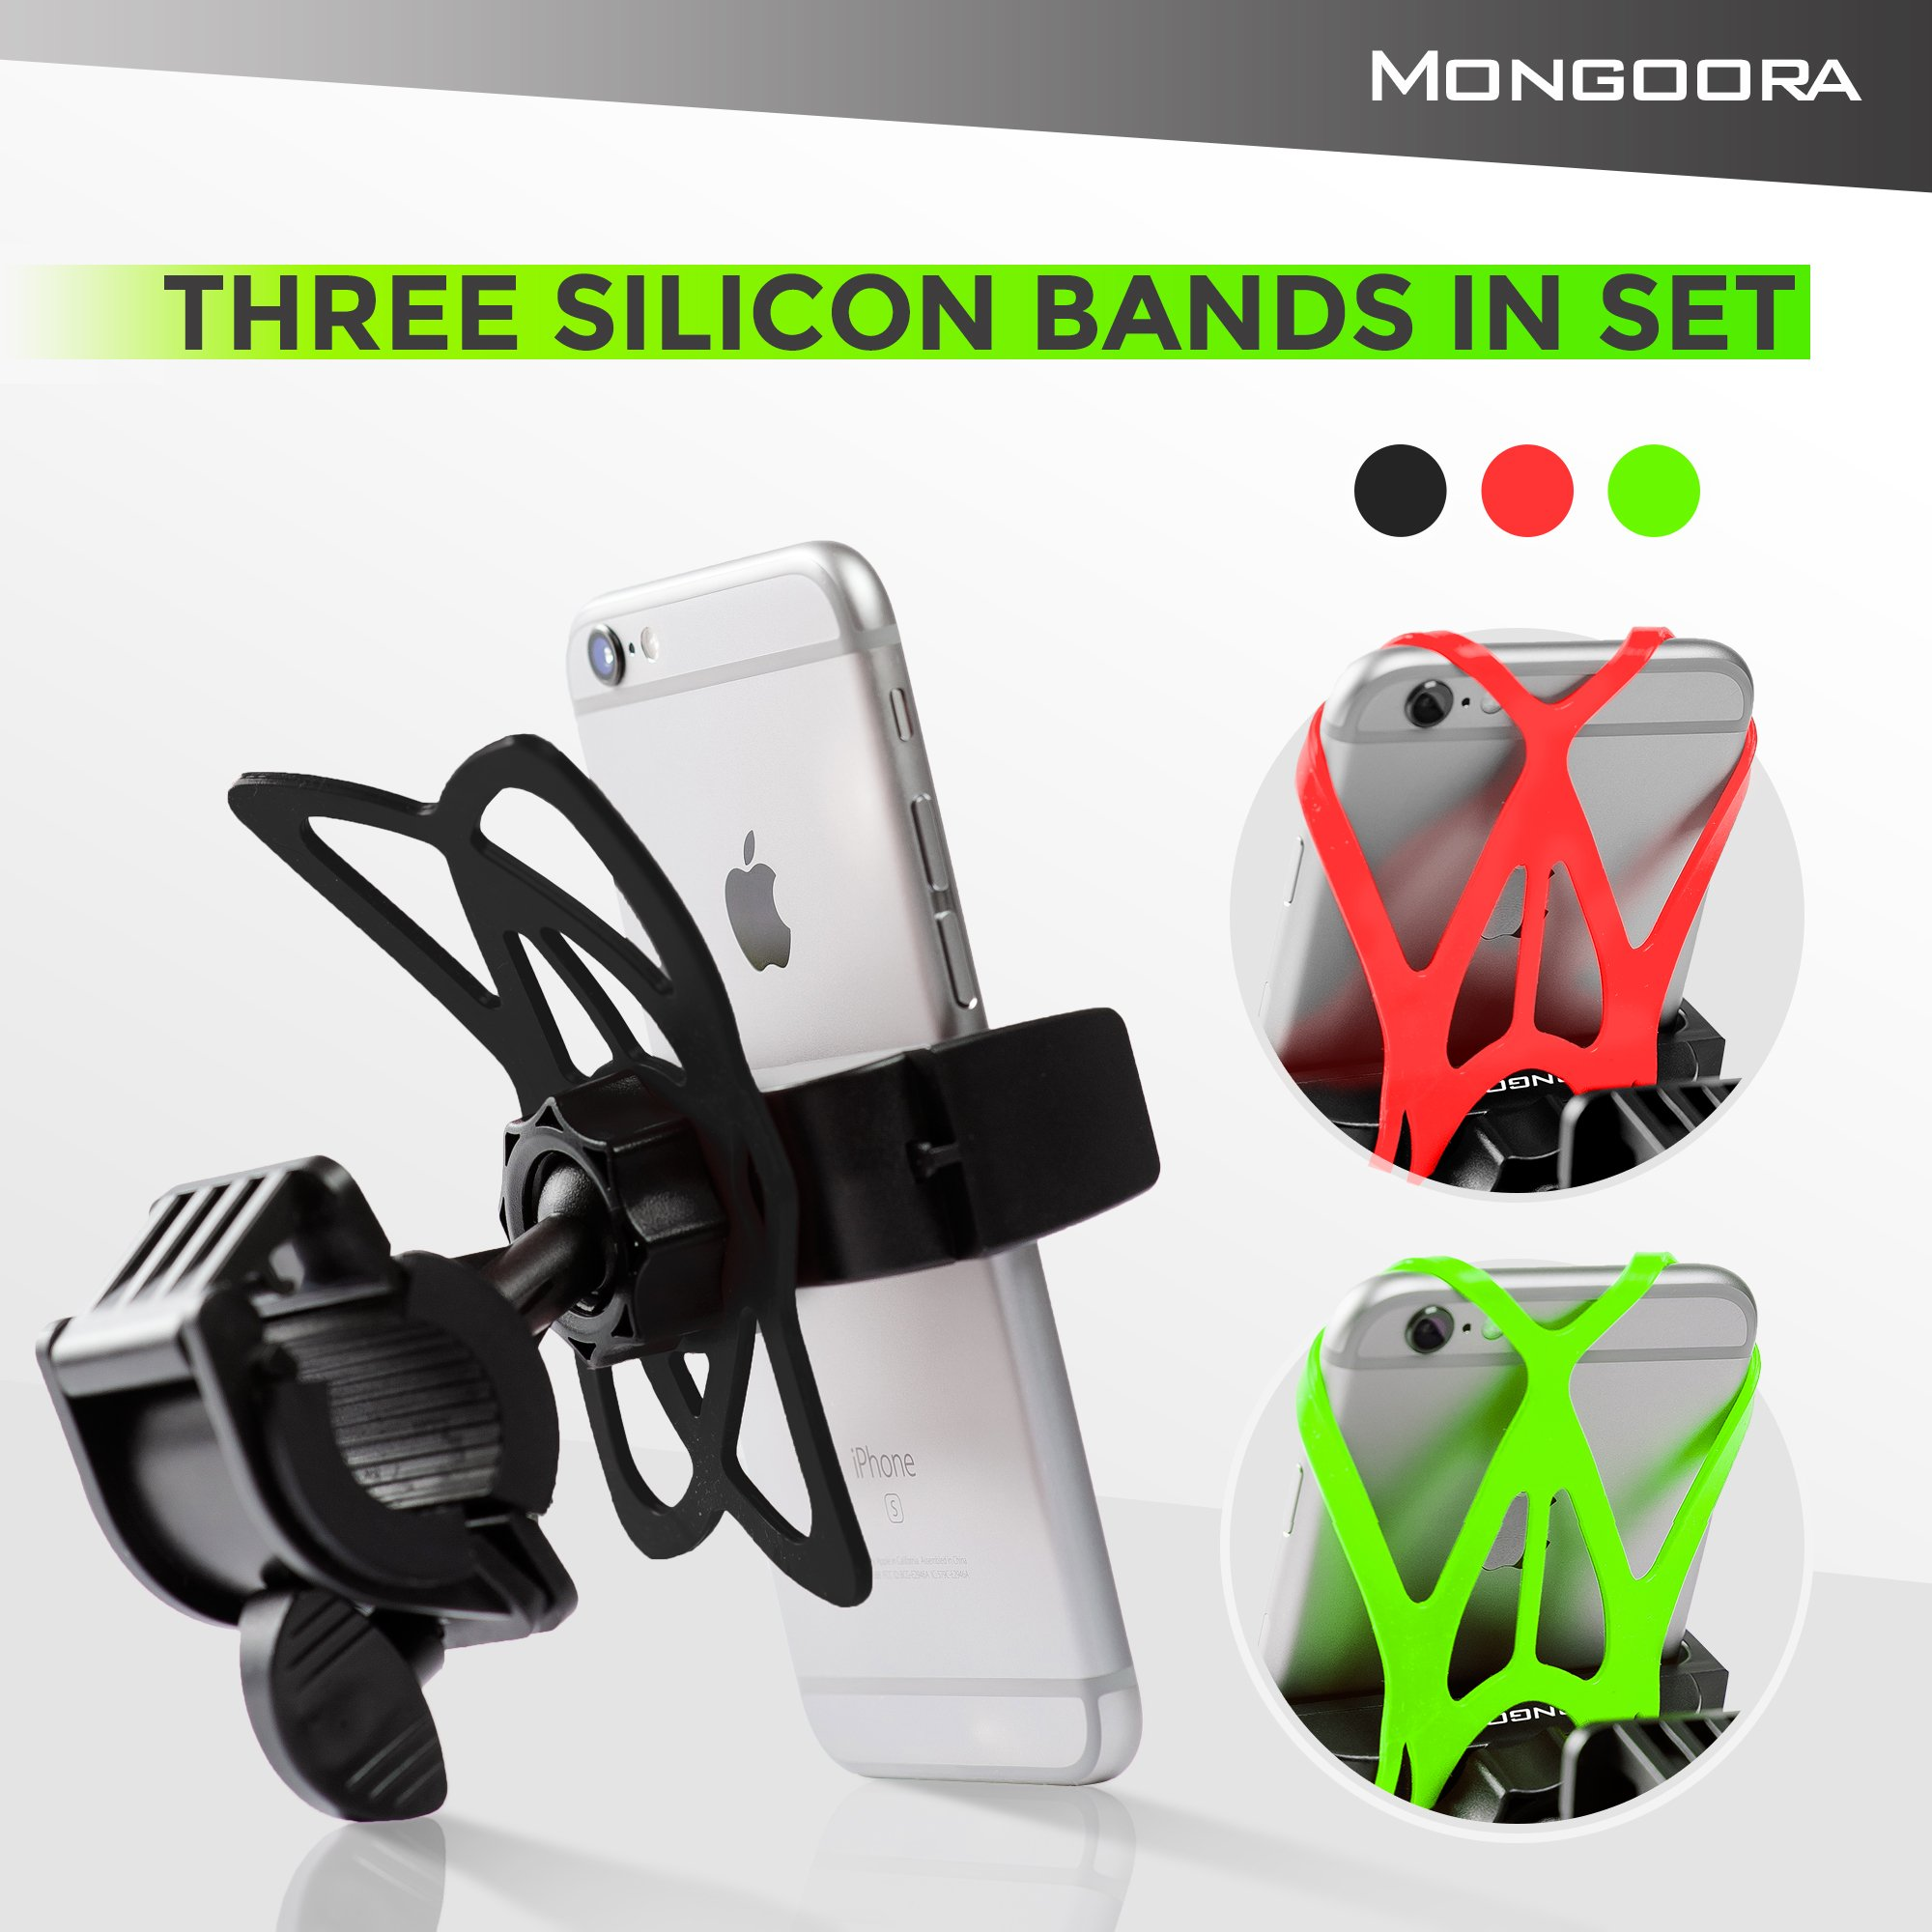 Bike Phone Mount for any Smart Phone: iPhone X 8 7 6 5 plus Samsung Galaxy S9 S8 S7 S7 S6 S5 S4 Edge, Nexus, Nokia, LG. Motorcycle, Bicycle Phone Mount. Mountain Bike Mount. Bike Accessories. by Mongoora (Image #6)